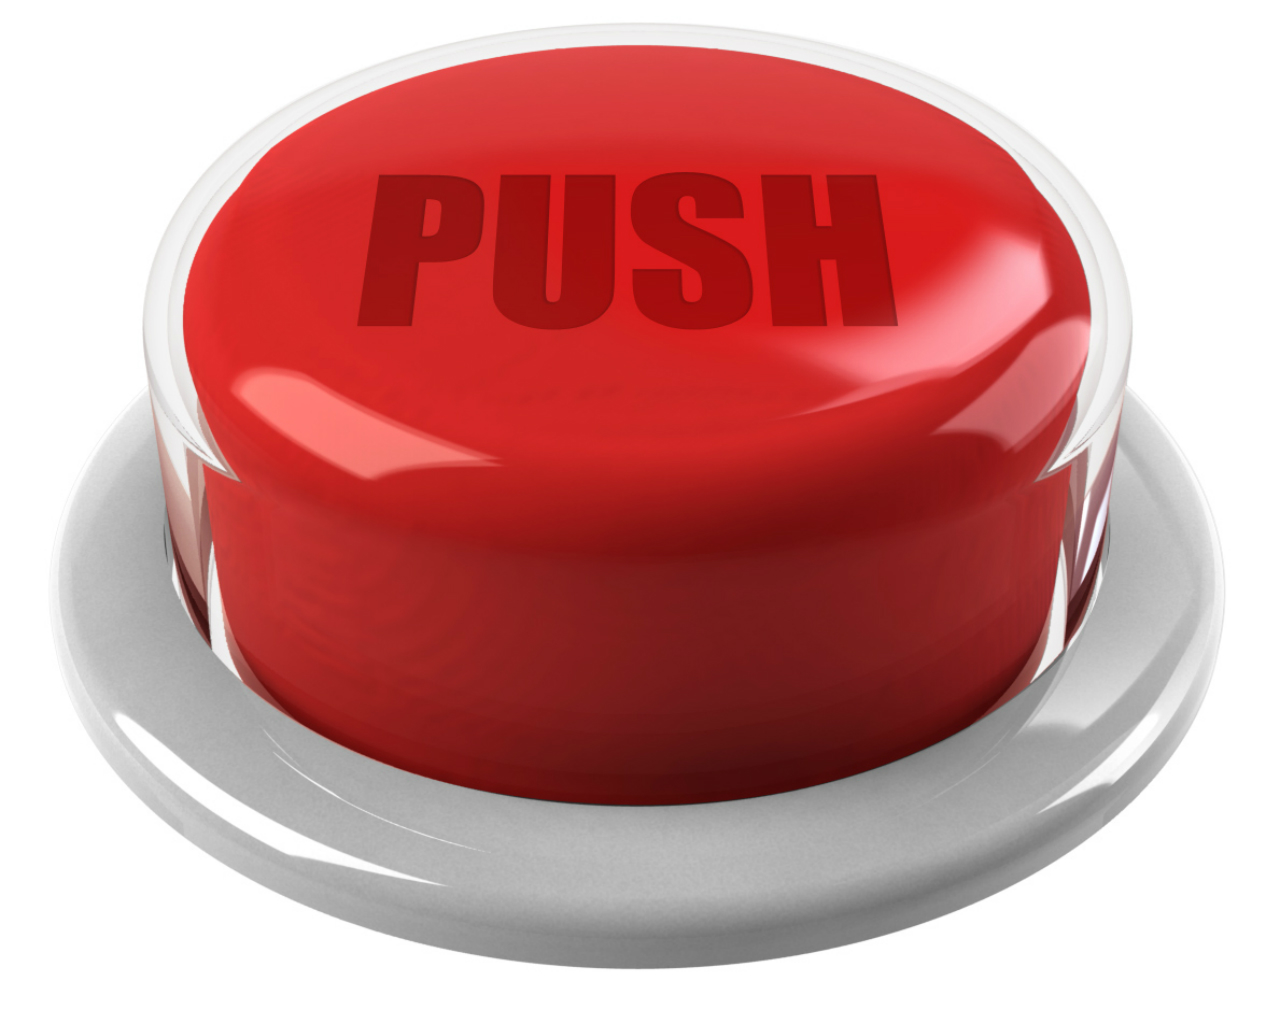 push_button1.jpg